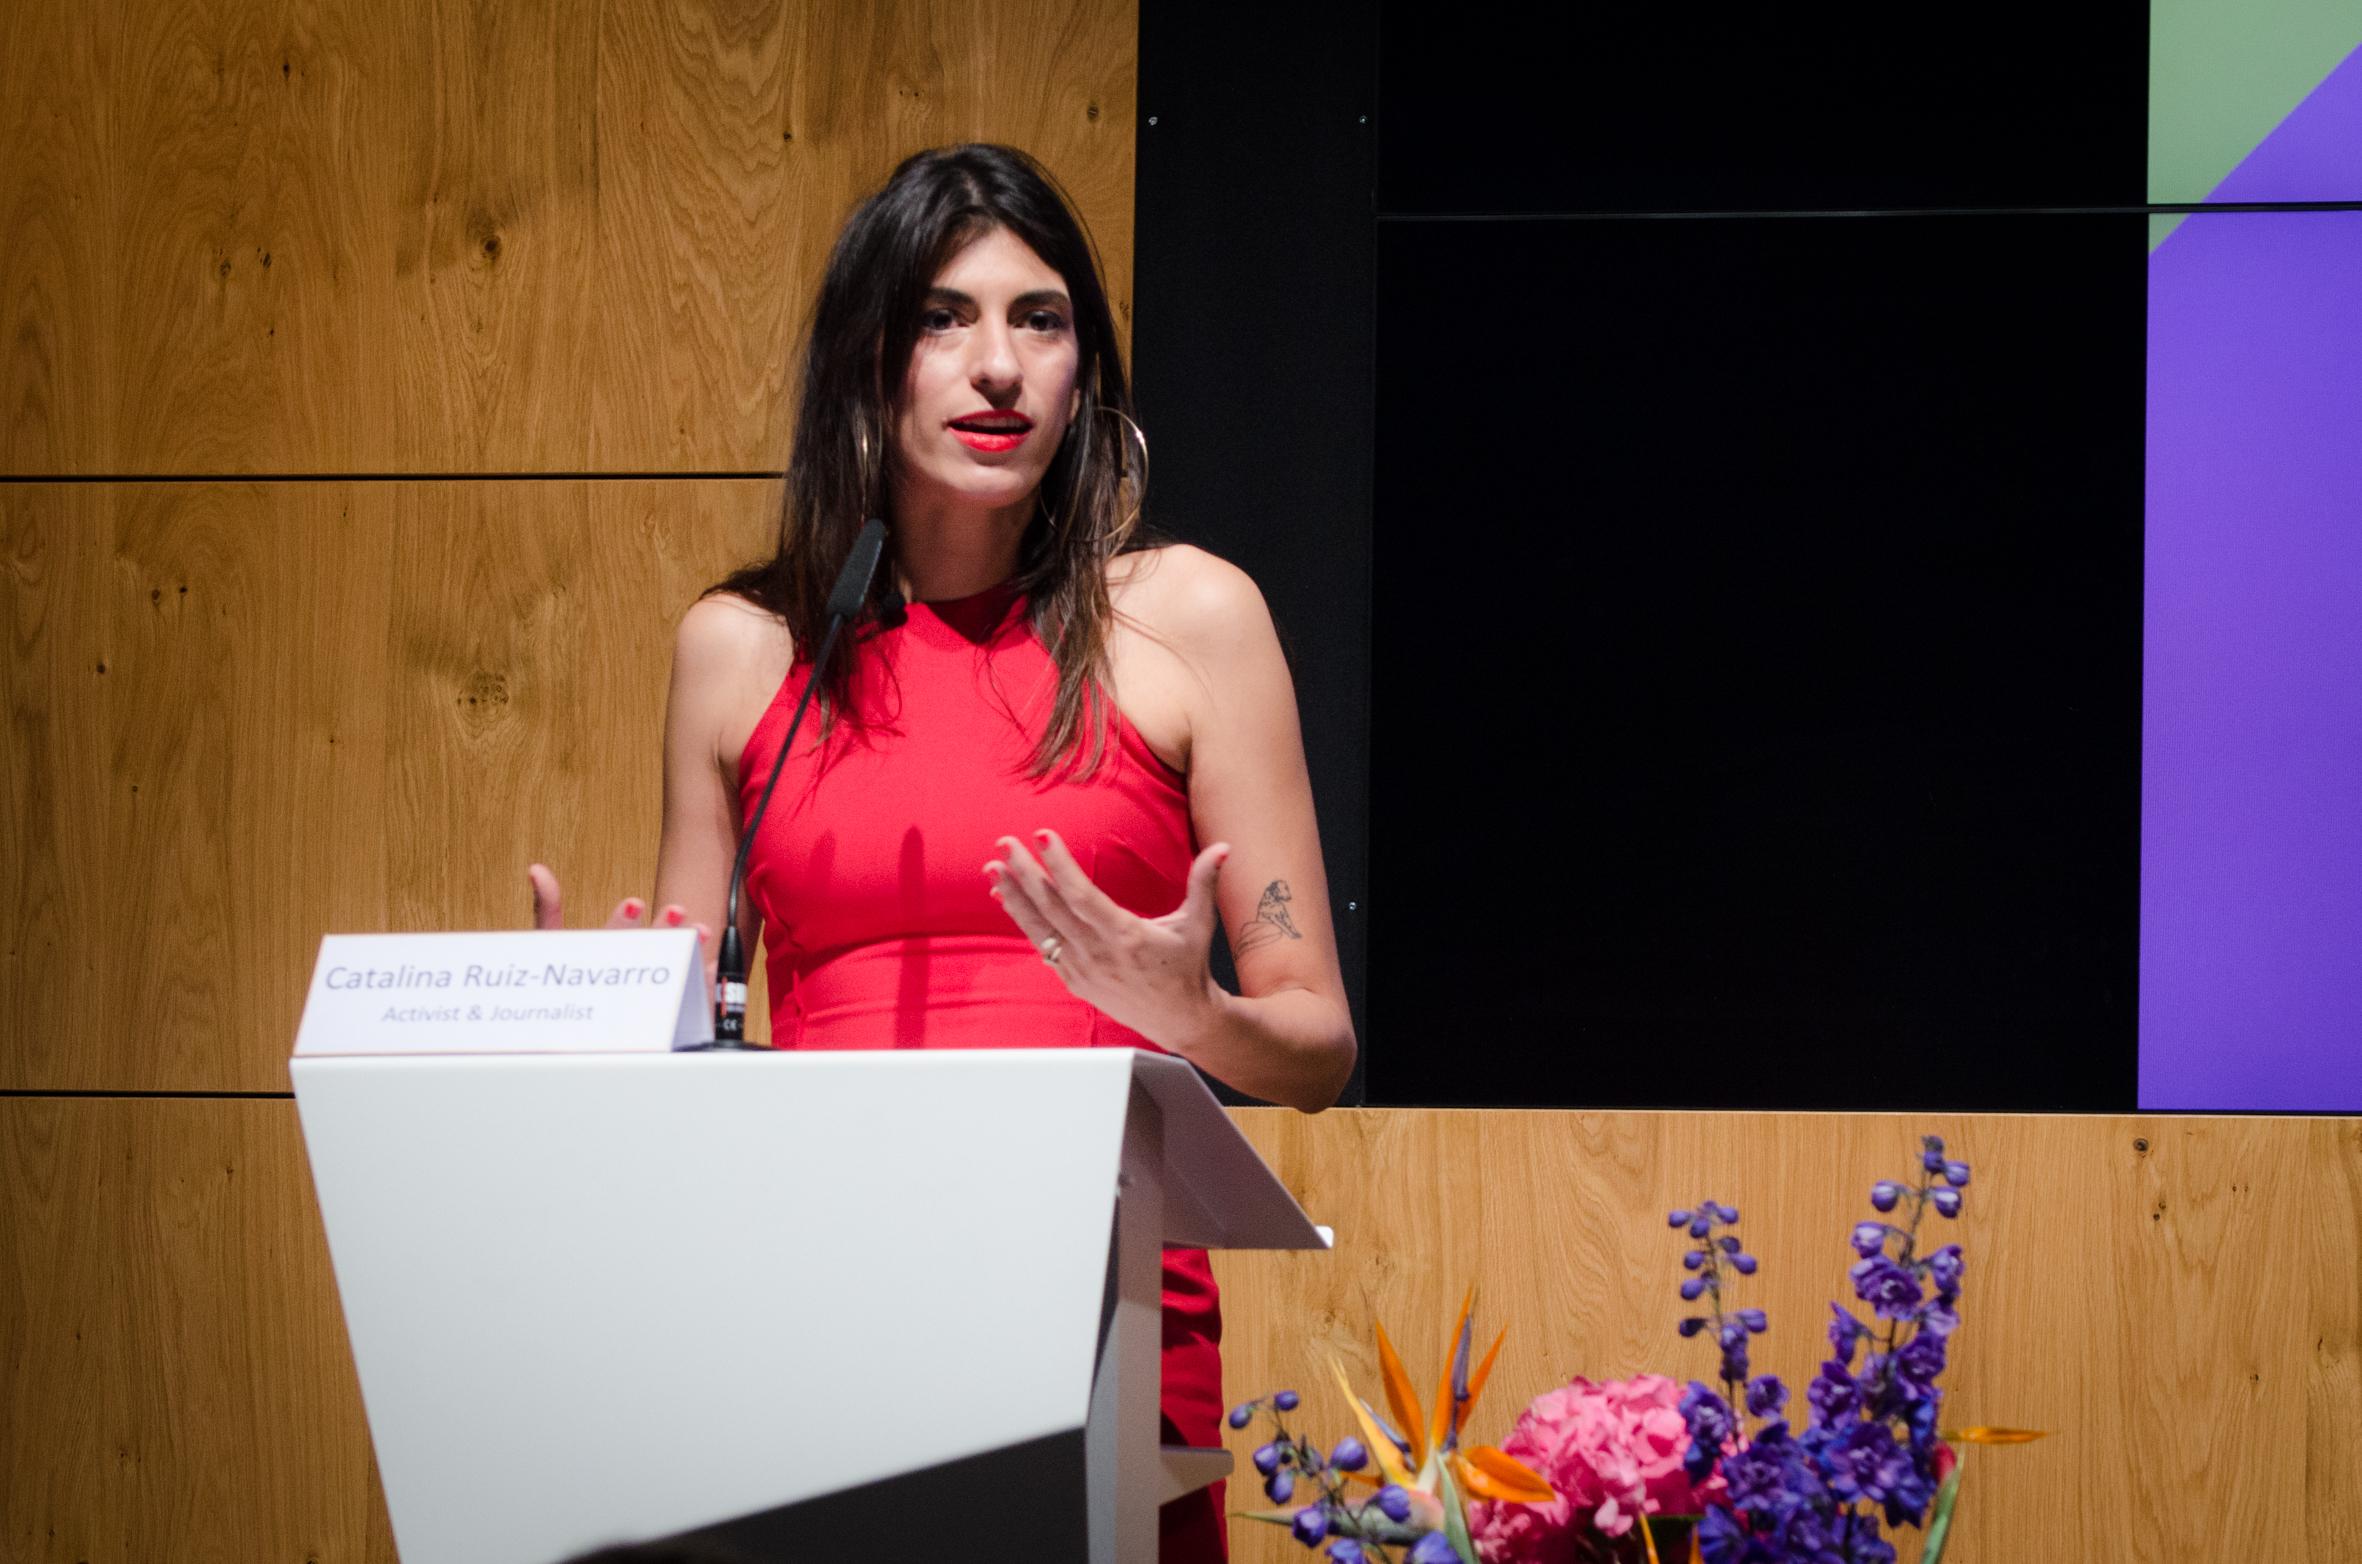 Catalina Ruiz-Navarro, Activist and Journalist, CFFP Advisory Council Member.